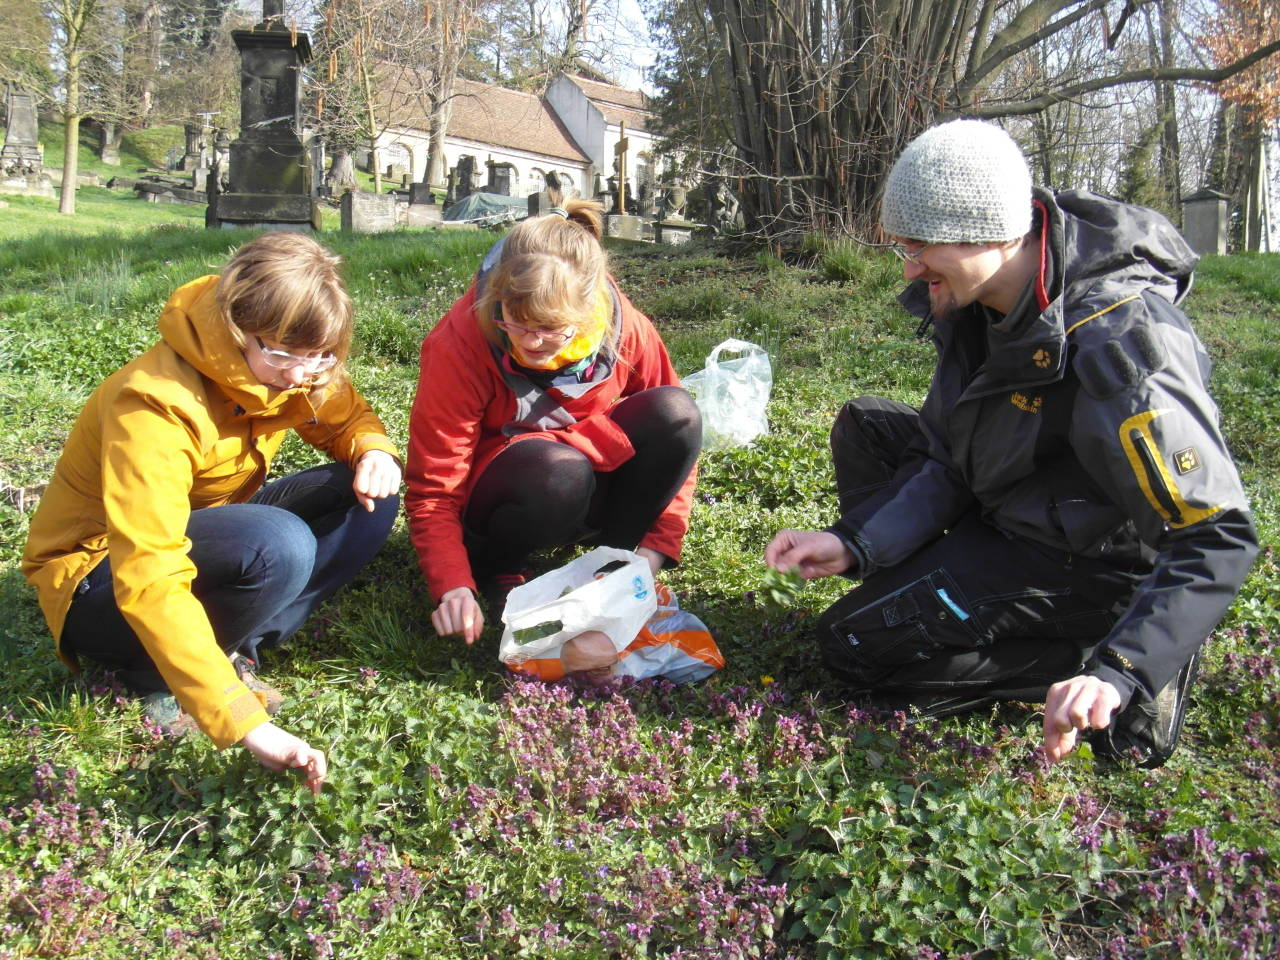 Kräuterführung zum Pflanzensammeln